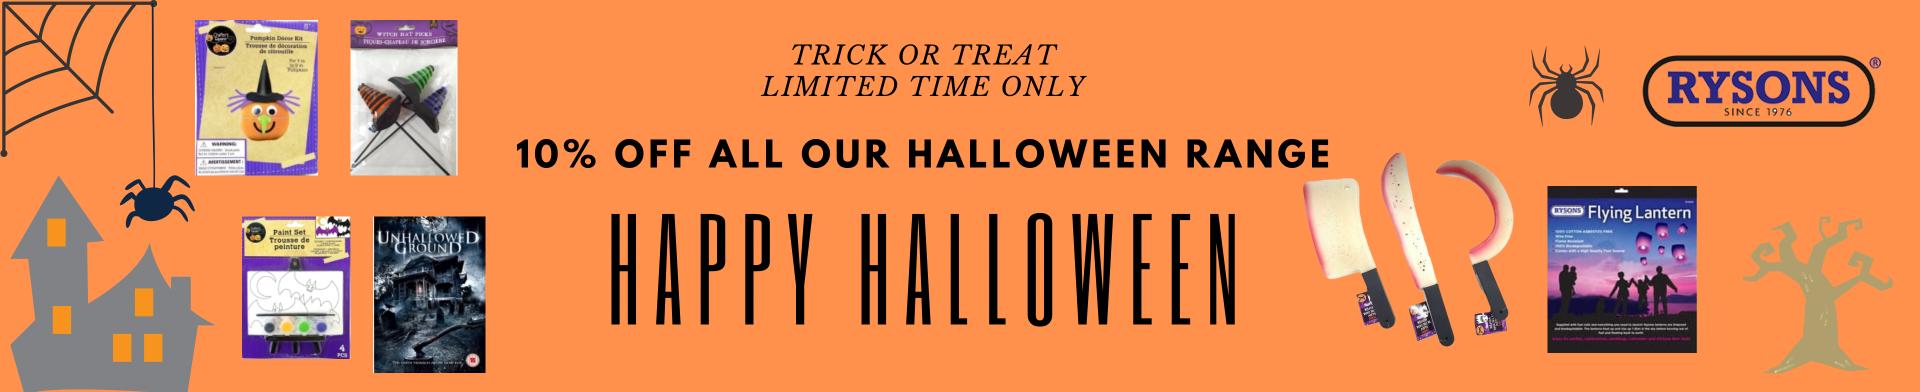 Rysons Halloween Rnage